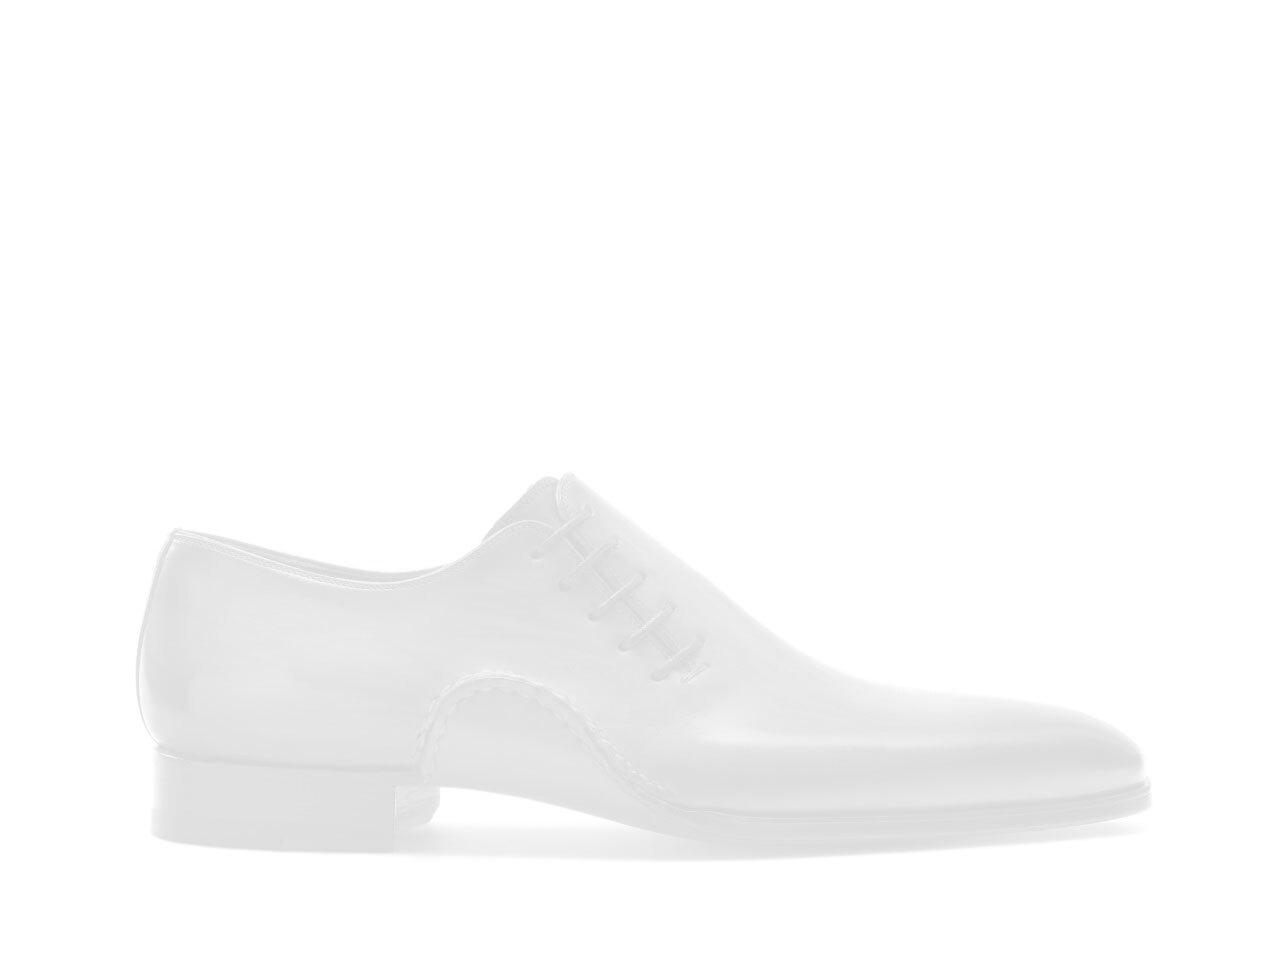 Sole of the Magnanni Arnoia White and Cuero Men's Sneakers